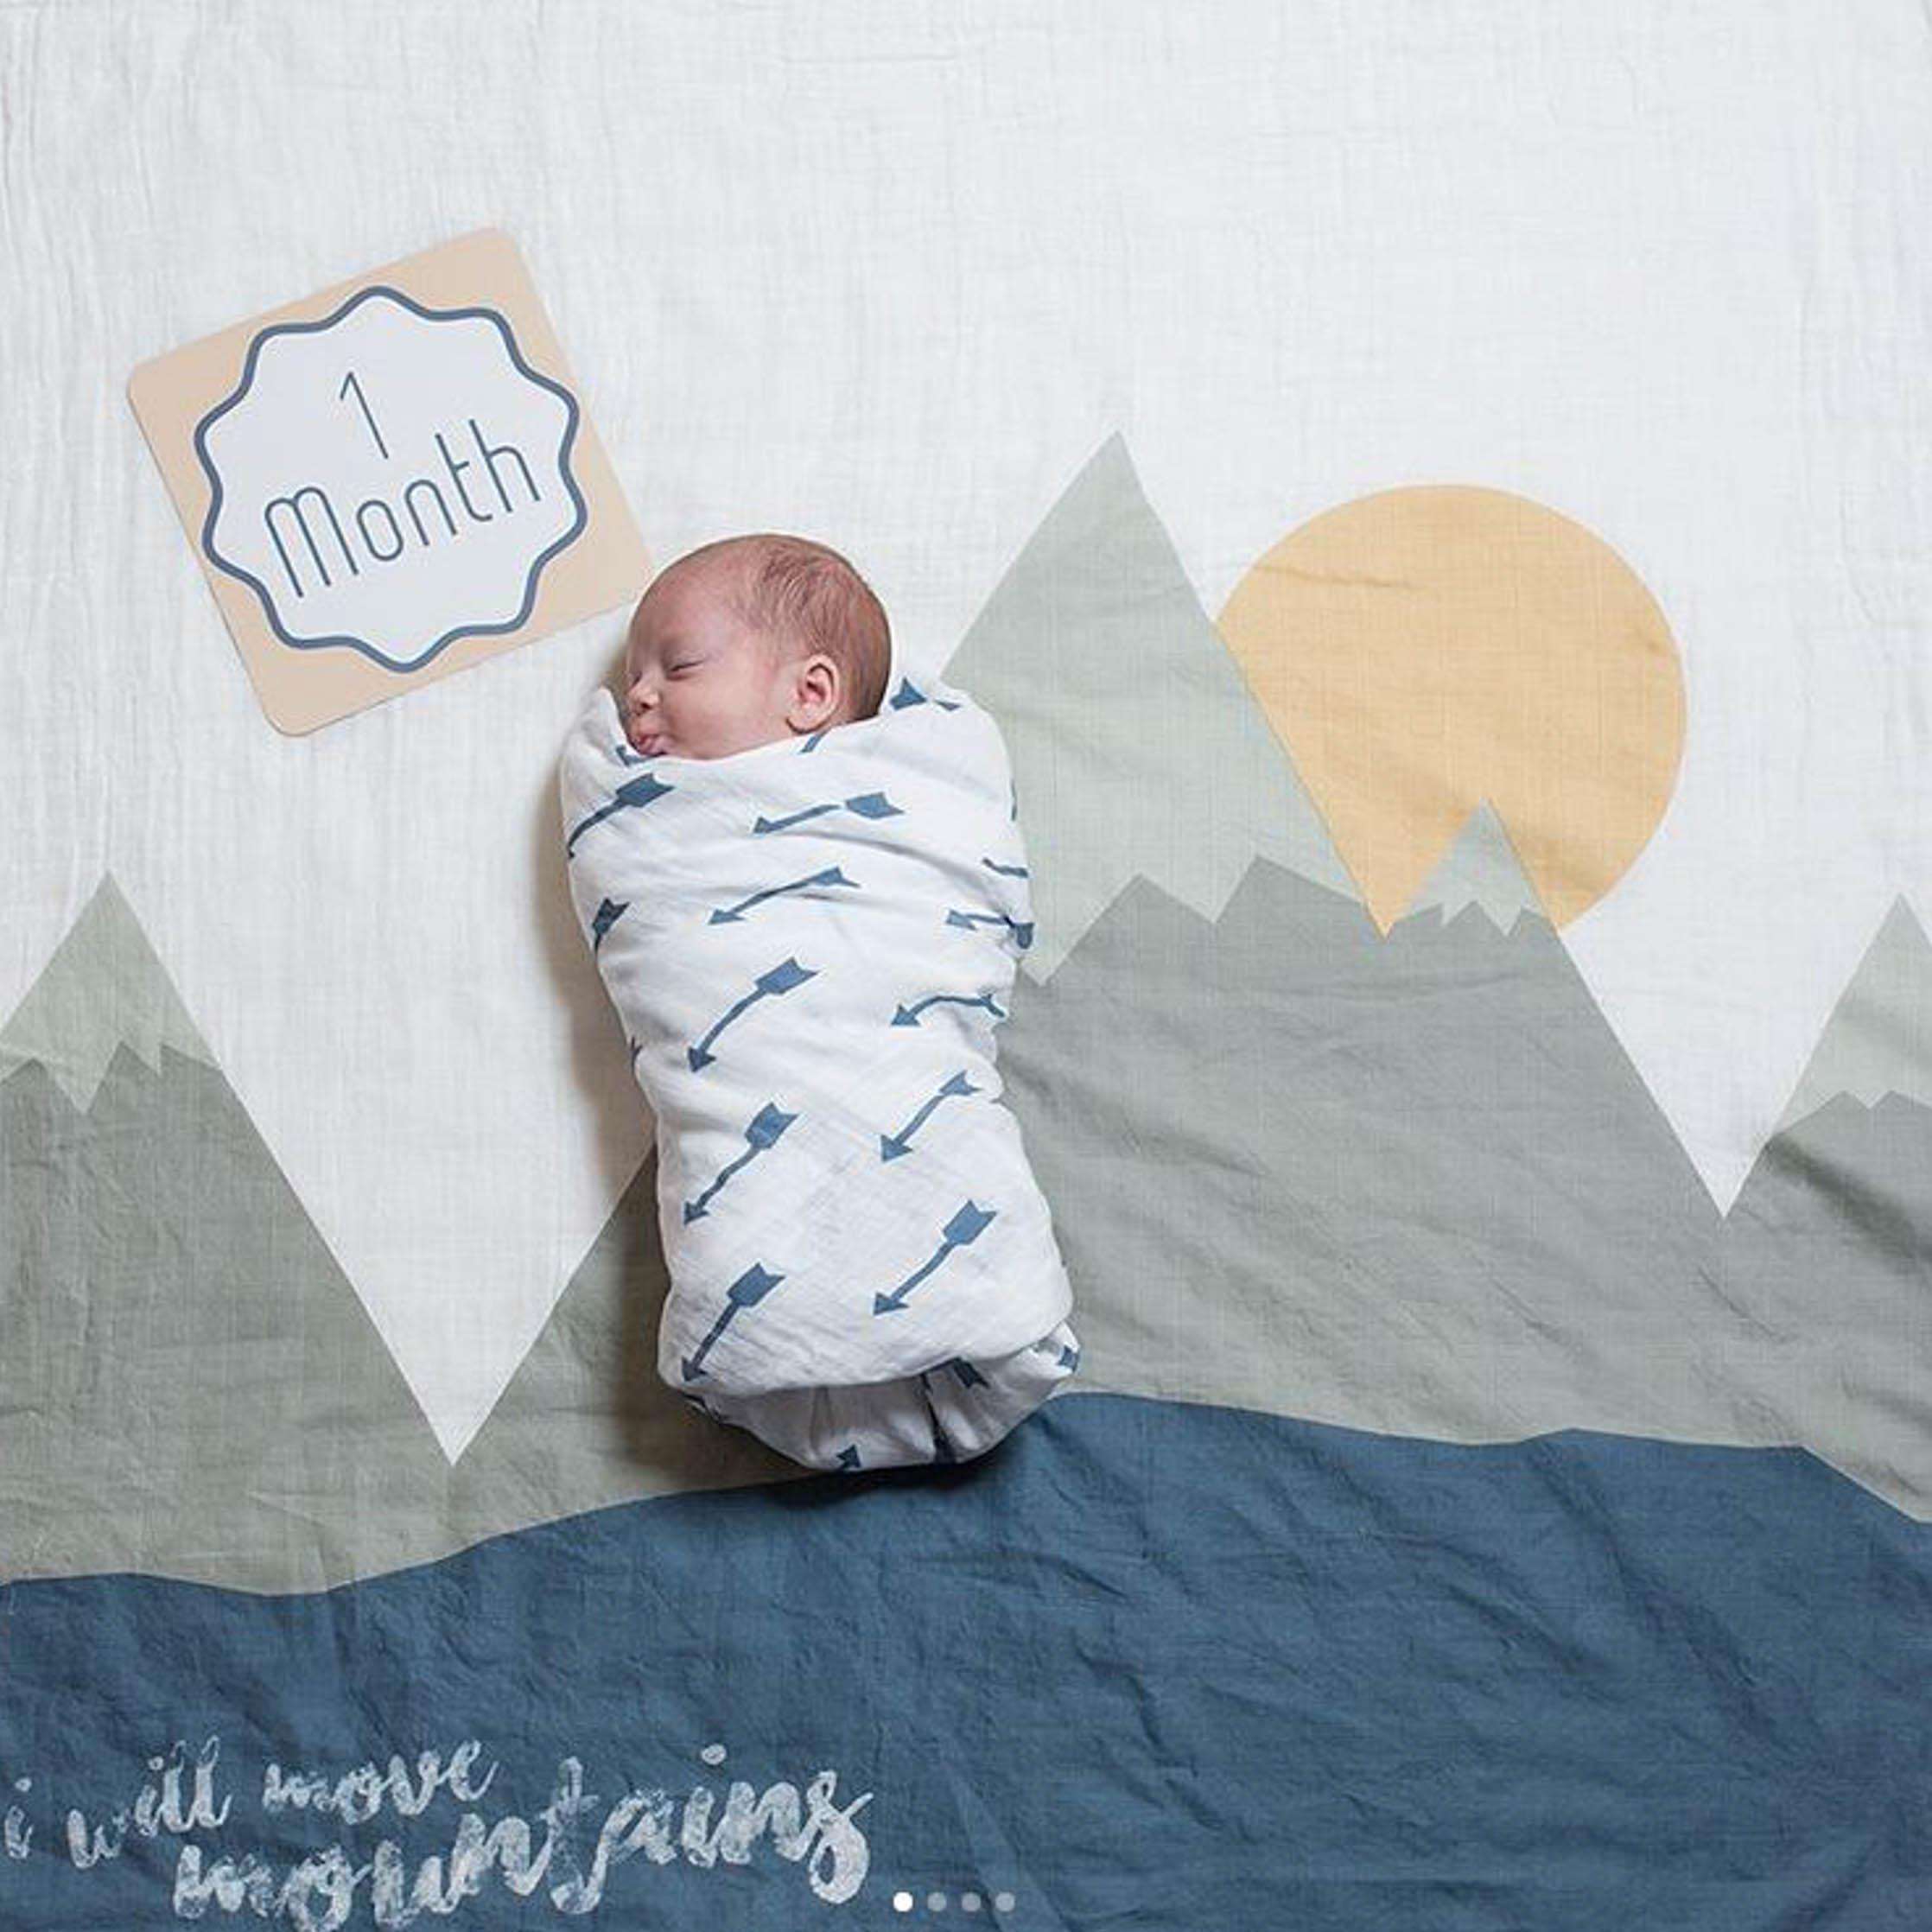 Instagram Project Nursery Week April 13